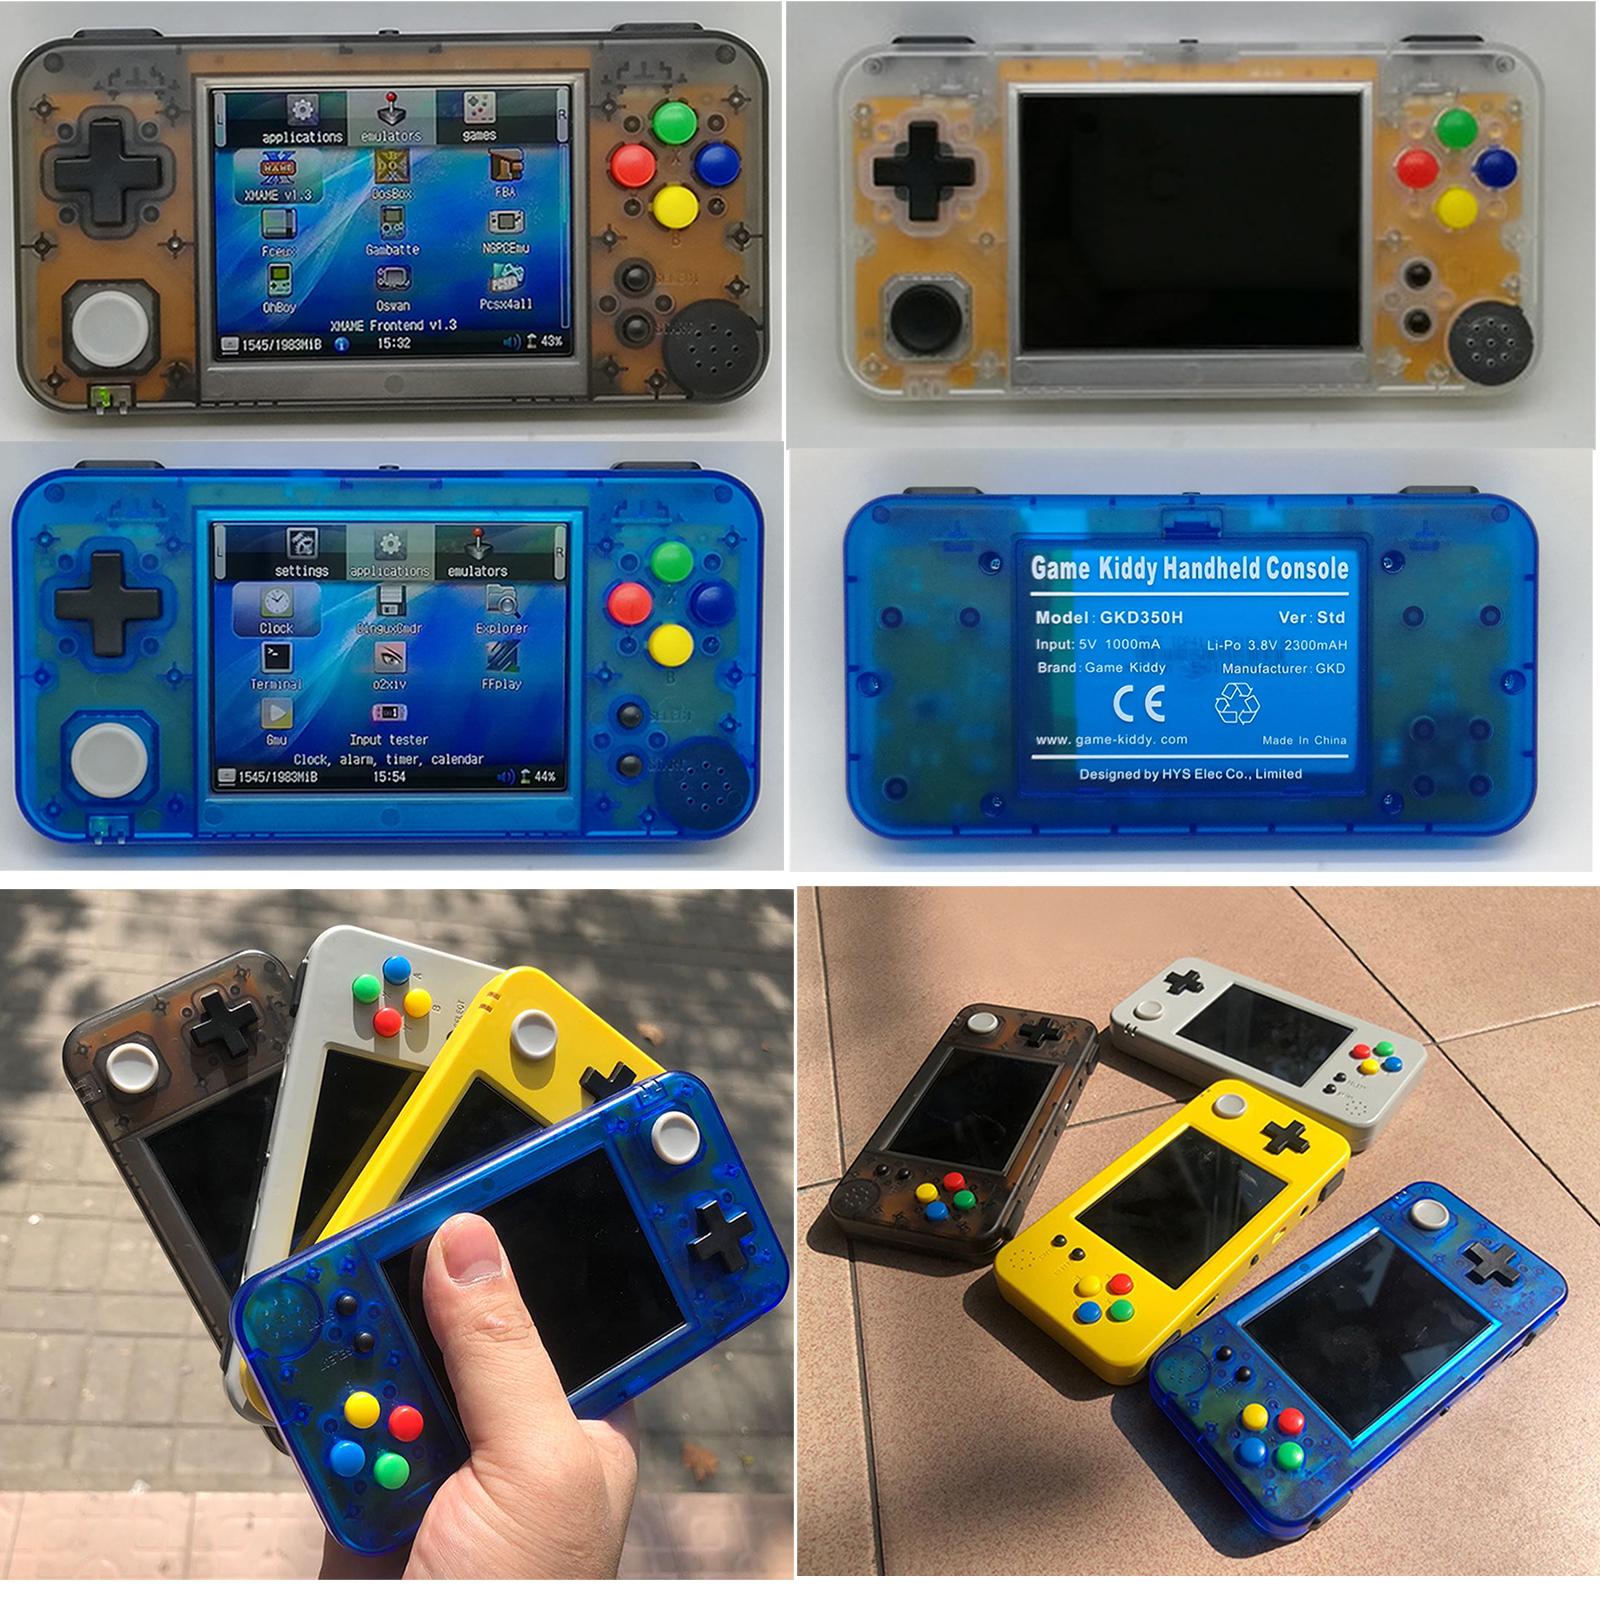 Mini Pocket Arcade Game Machine Handheld 150x Video Games LCD Retro Gamer Gift